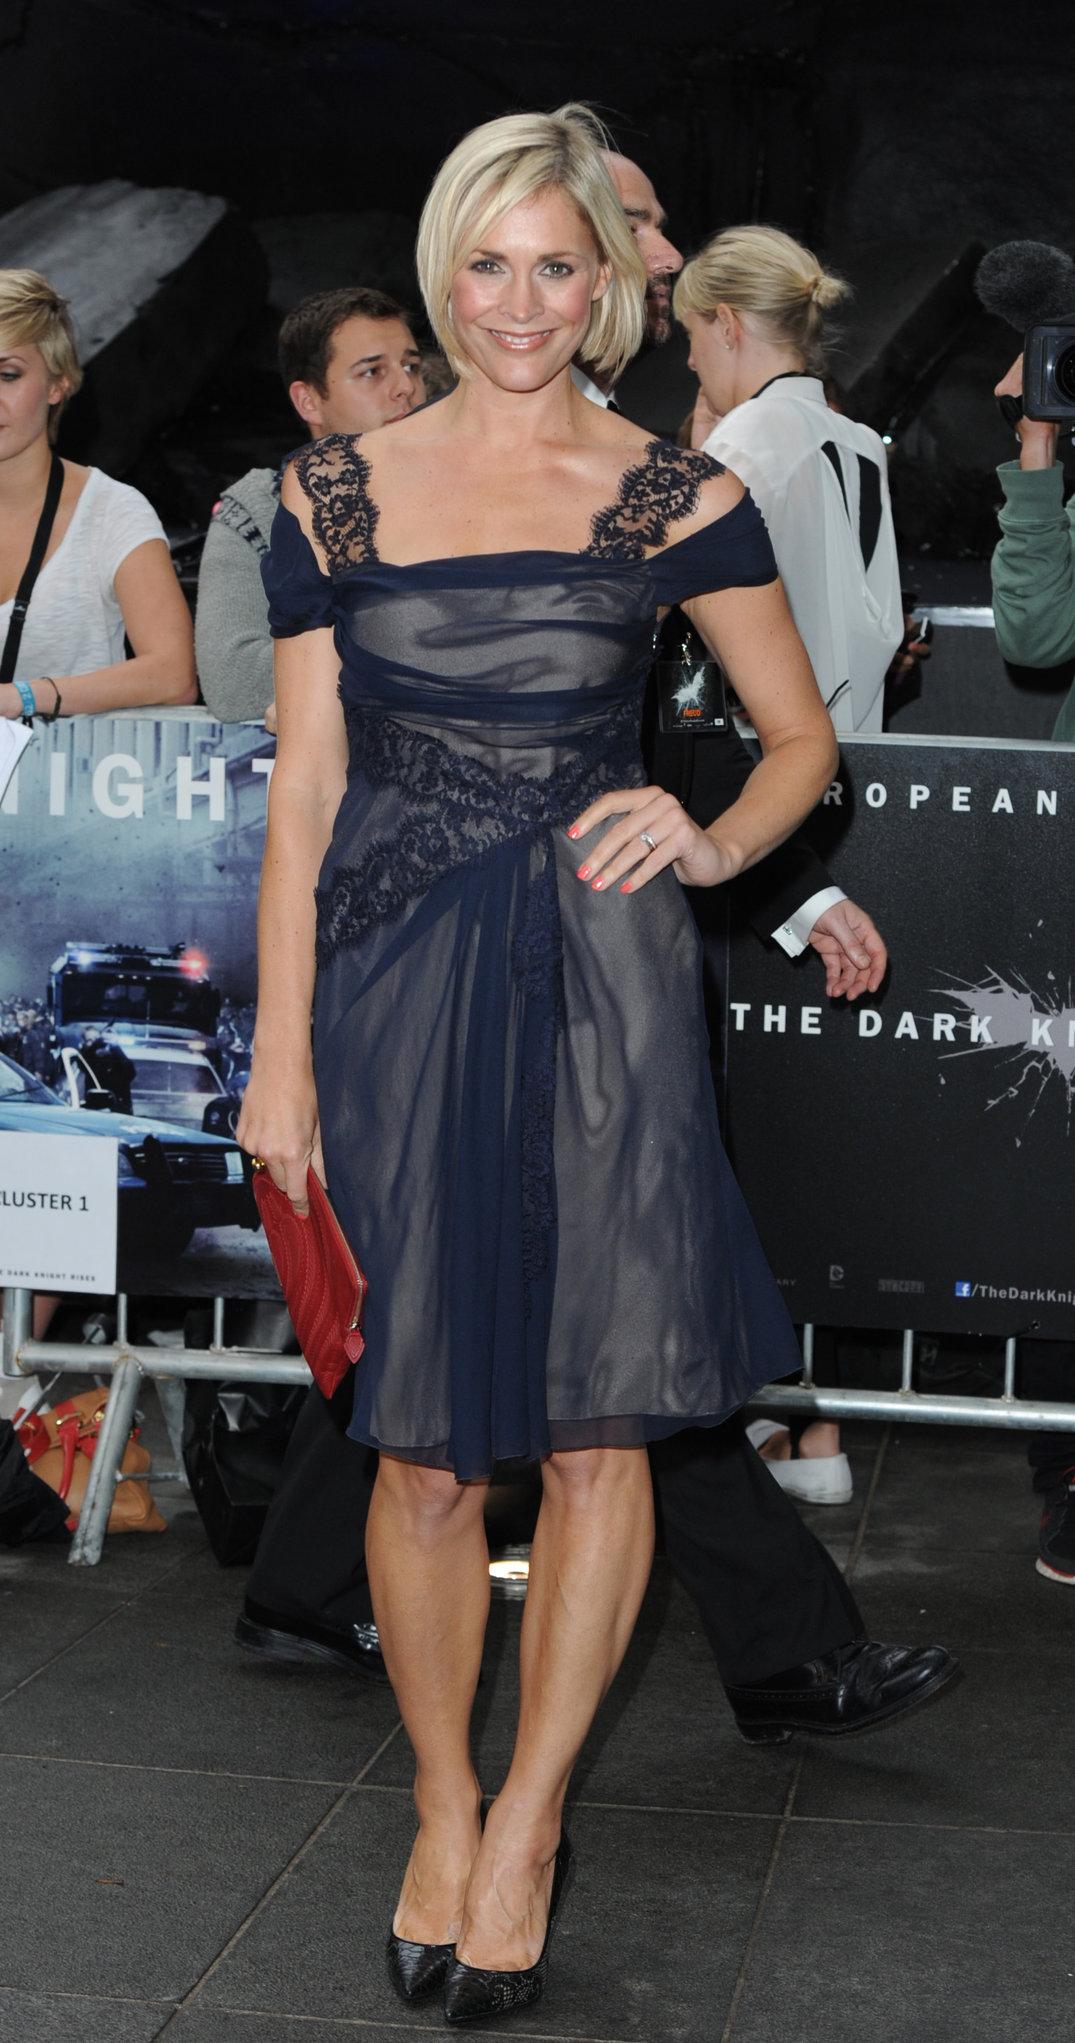 Jenni Falconer - 'The Dark Knight Rises', London - July 18, 2012